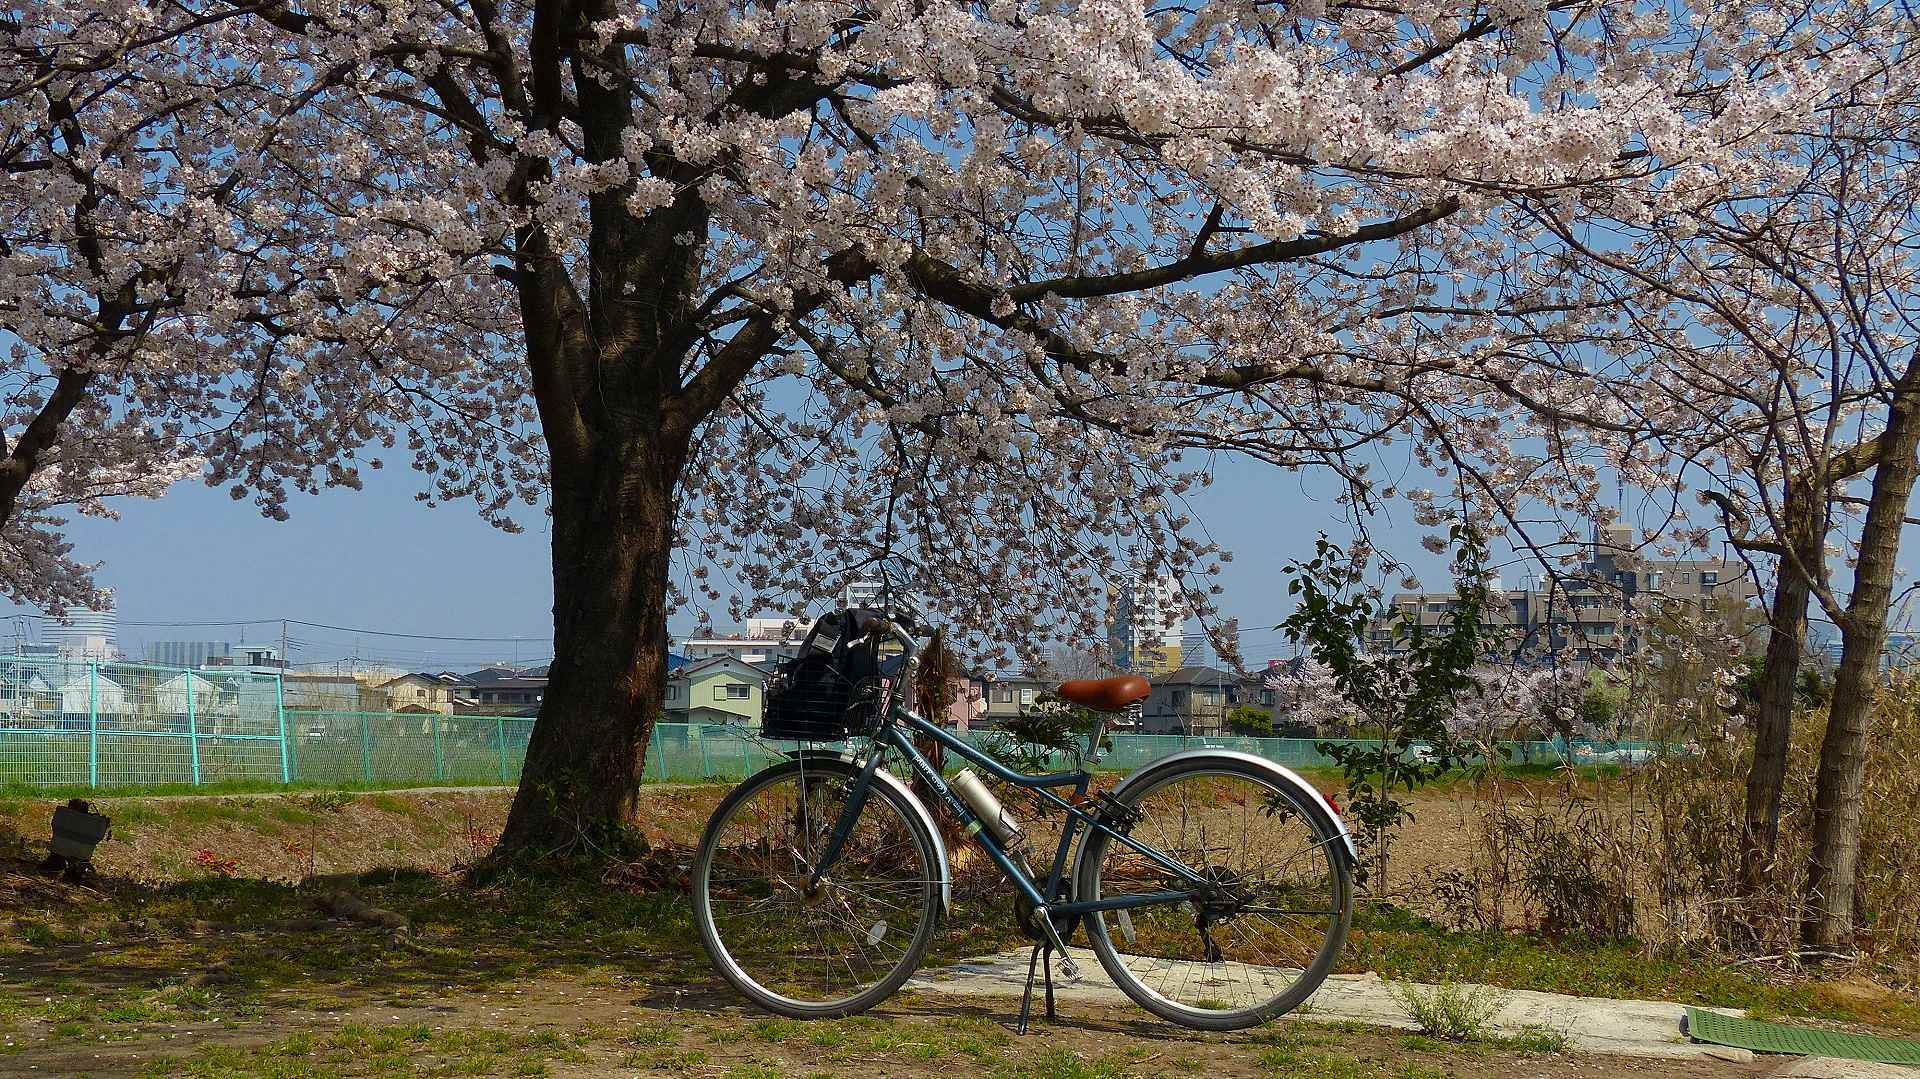 満開の桜を堪能! 【 2018 3/28(水) 】_a0185081_19305672.jpg